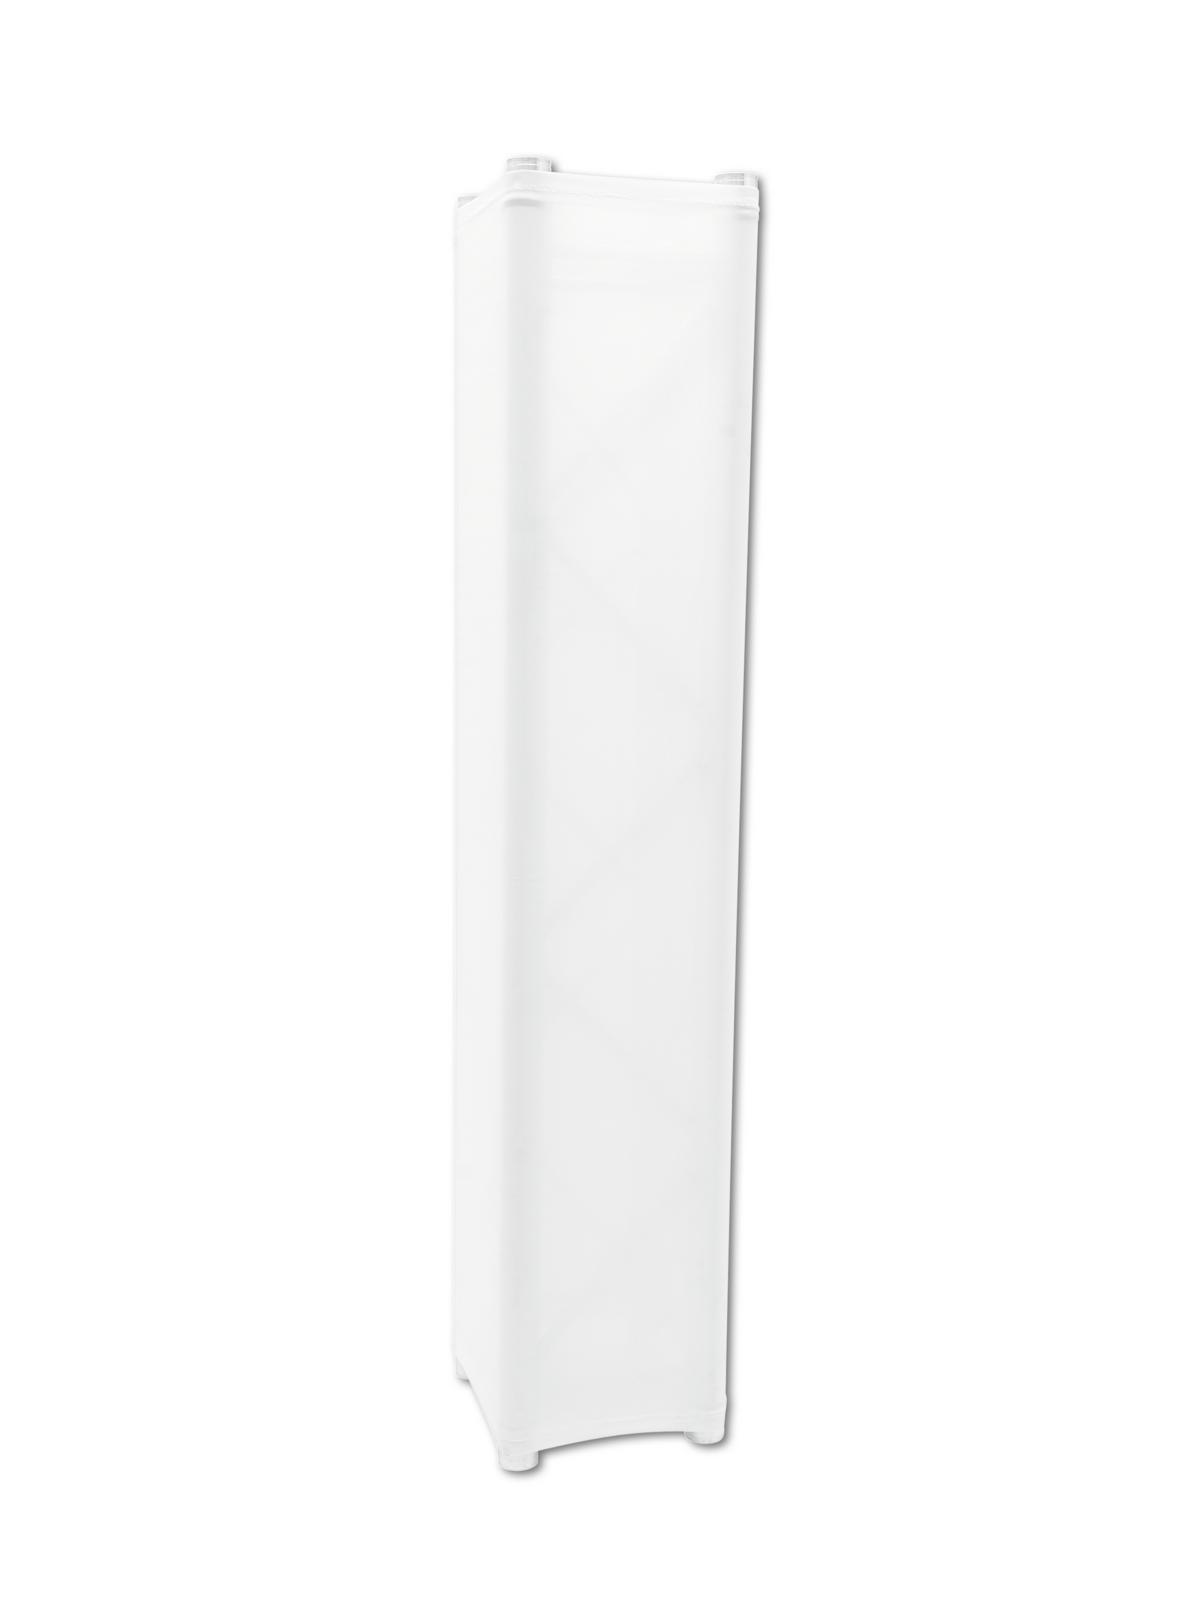 ESPANDERE XPTC15 Capriata di copertura 150cm bianco